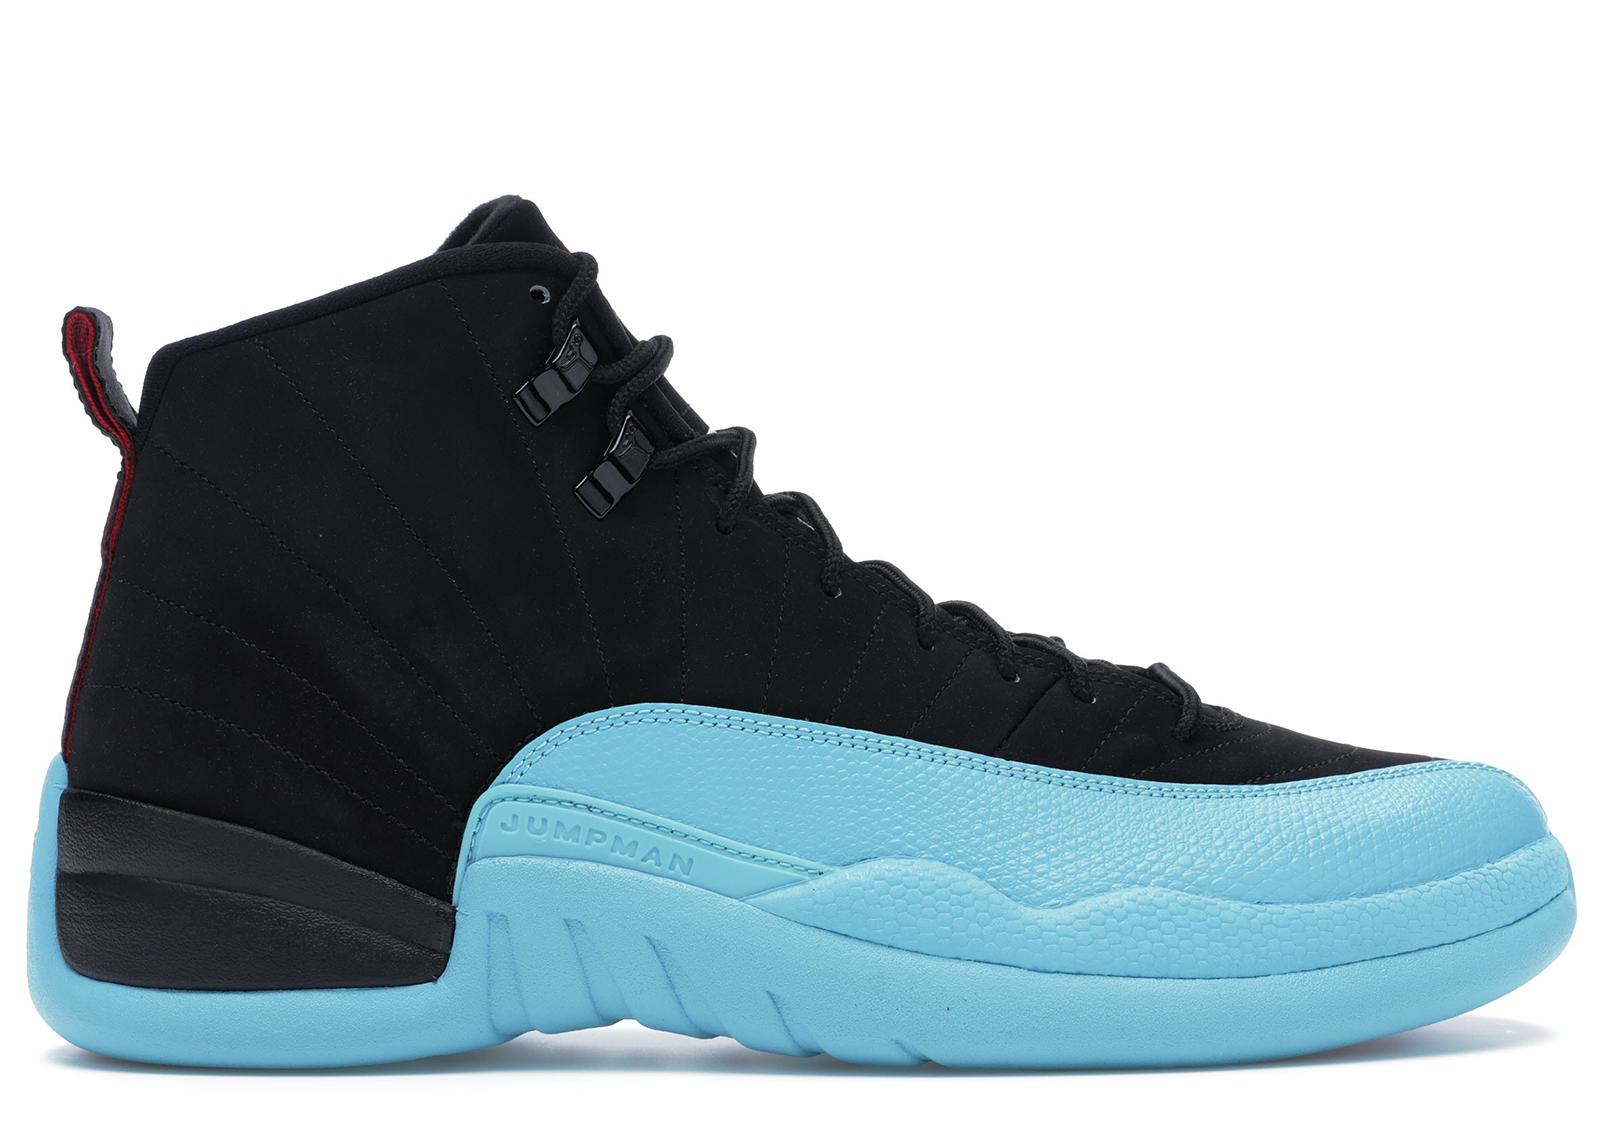 Jordan 12 Retro Gamma Blue - 130690-027